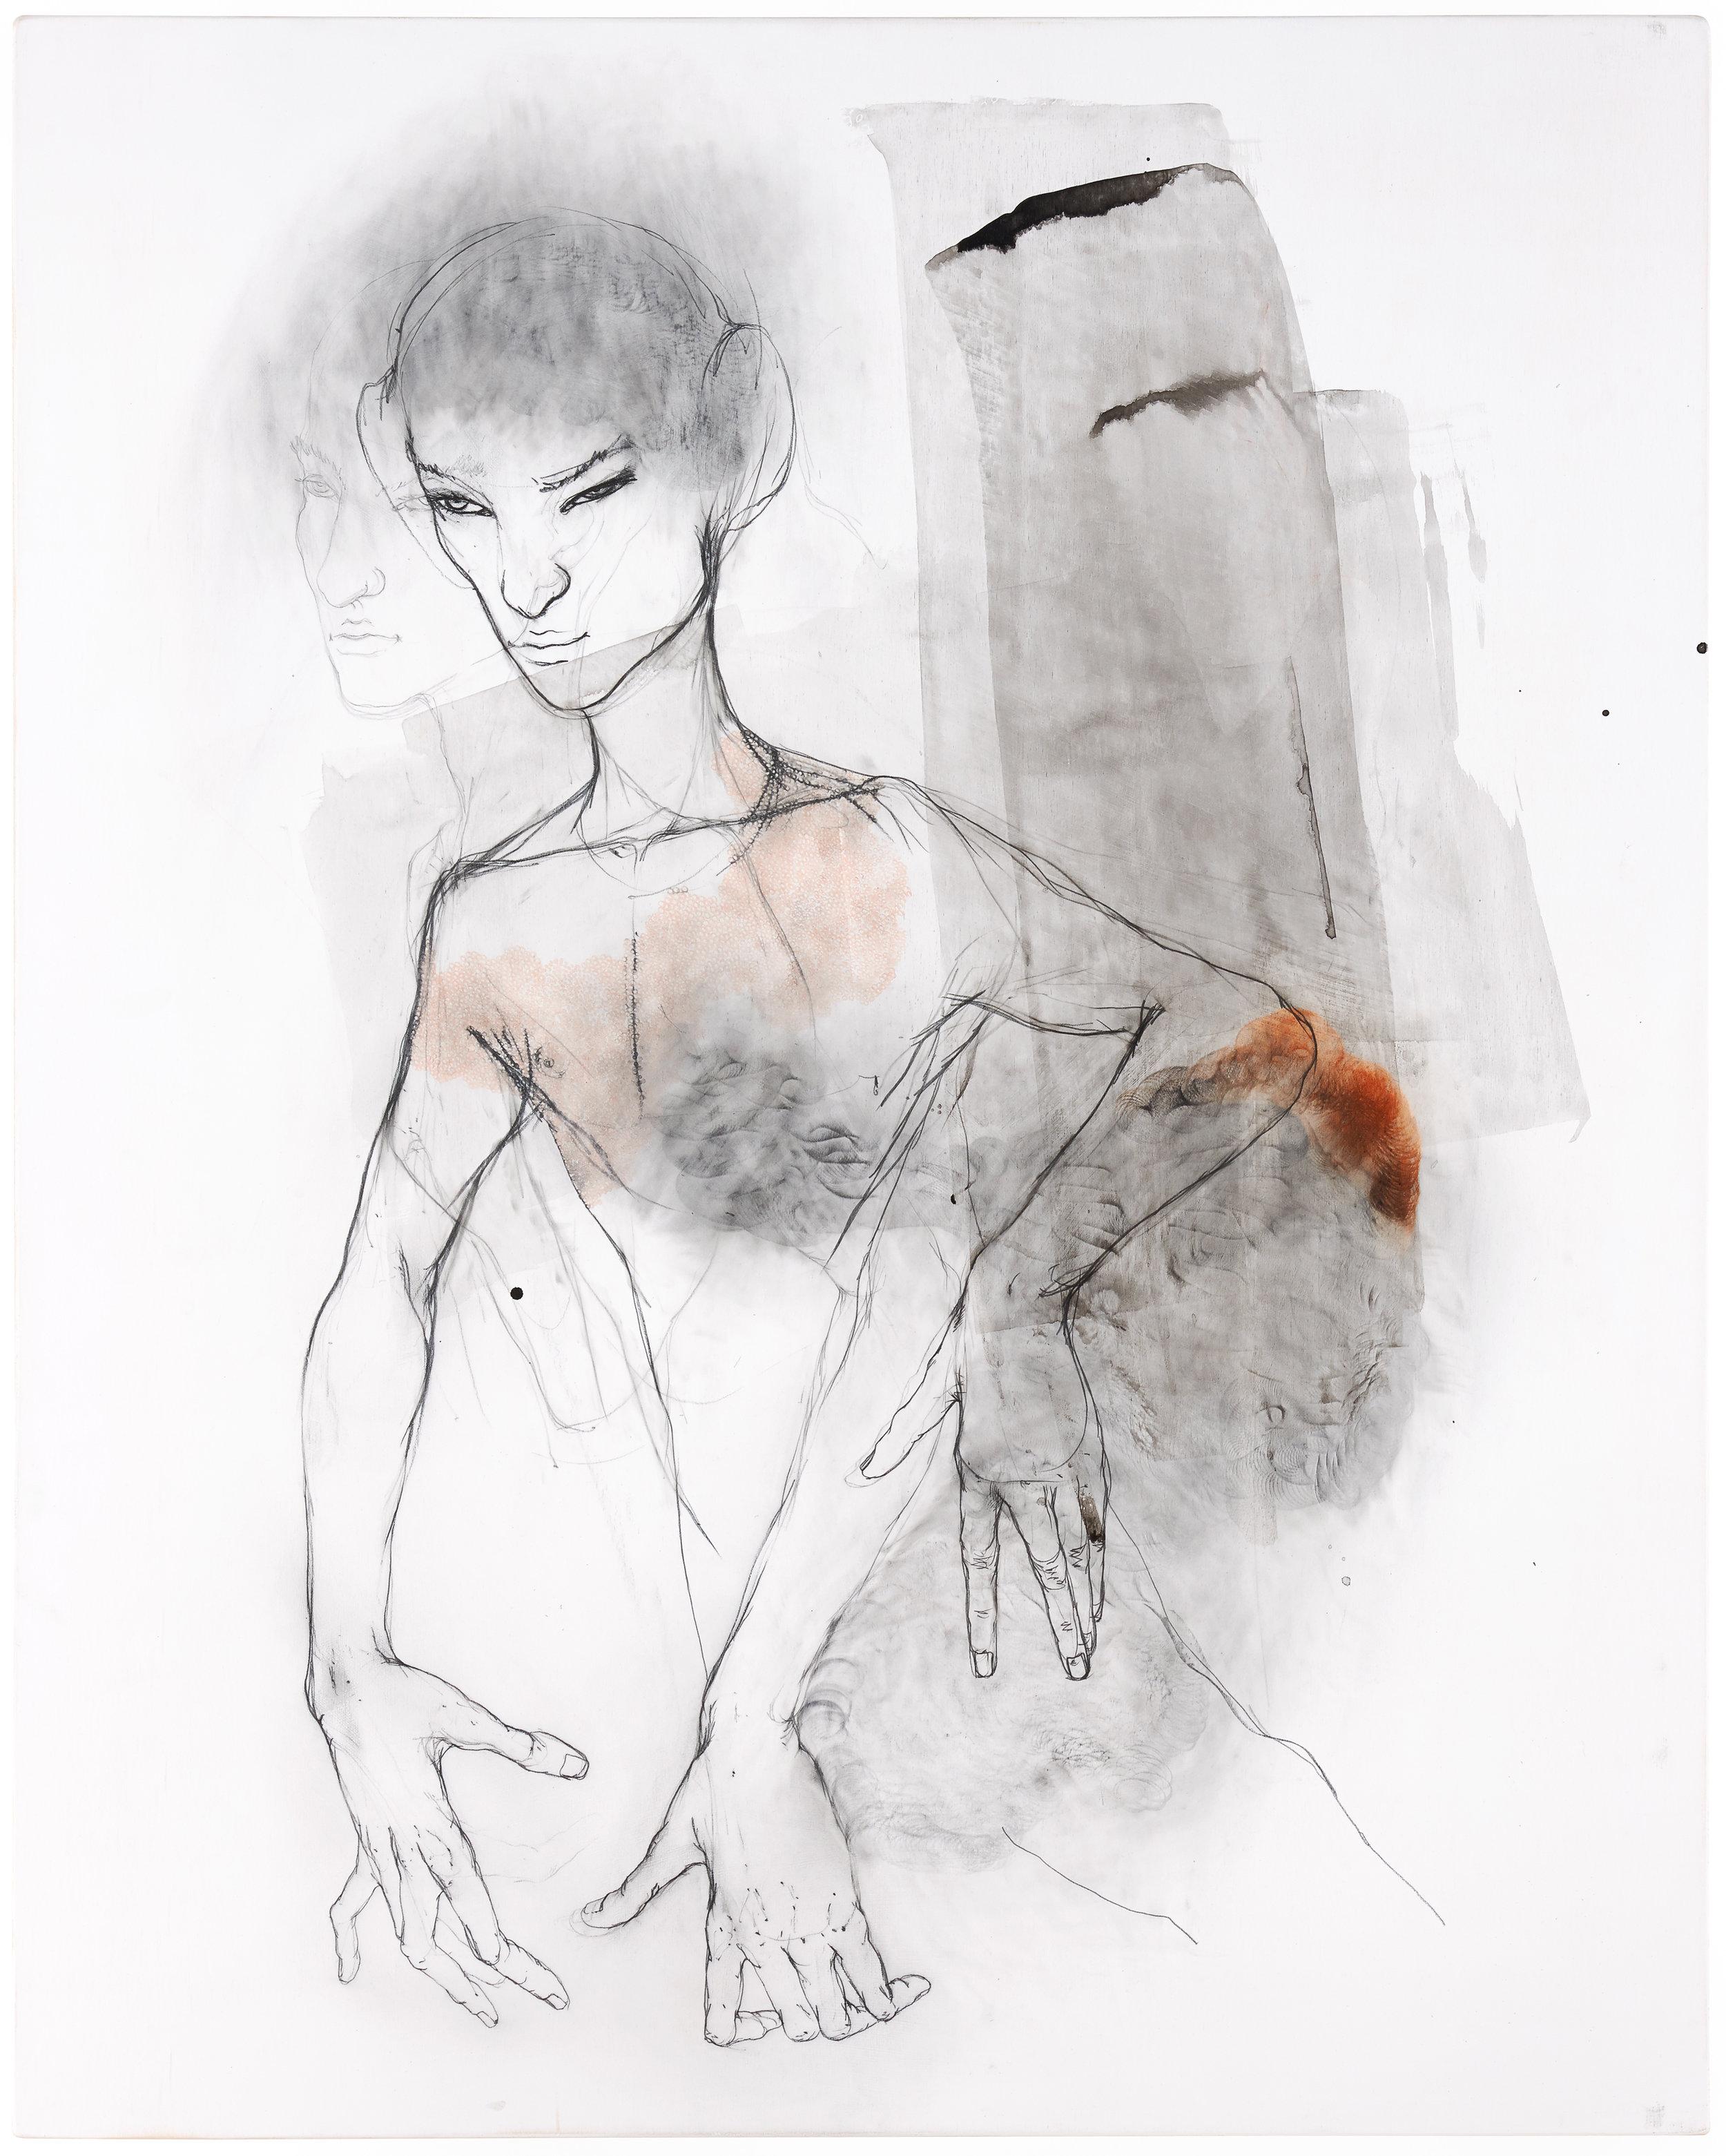 Peter Senoner, Folliastri (Y14N03), 2018, graphite, pigment on beechwood, 100 x 80 cm